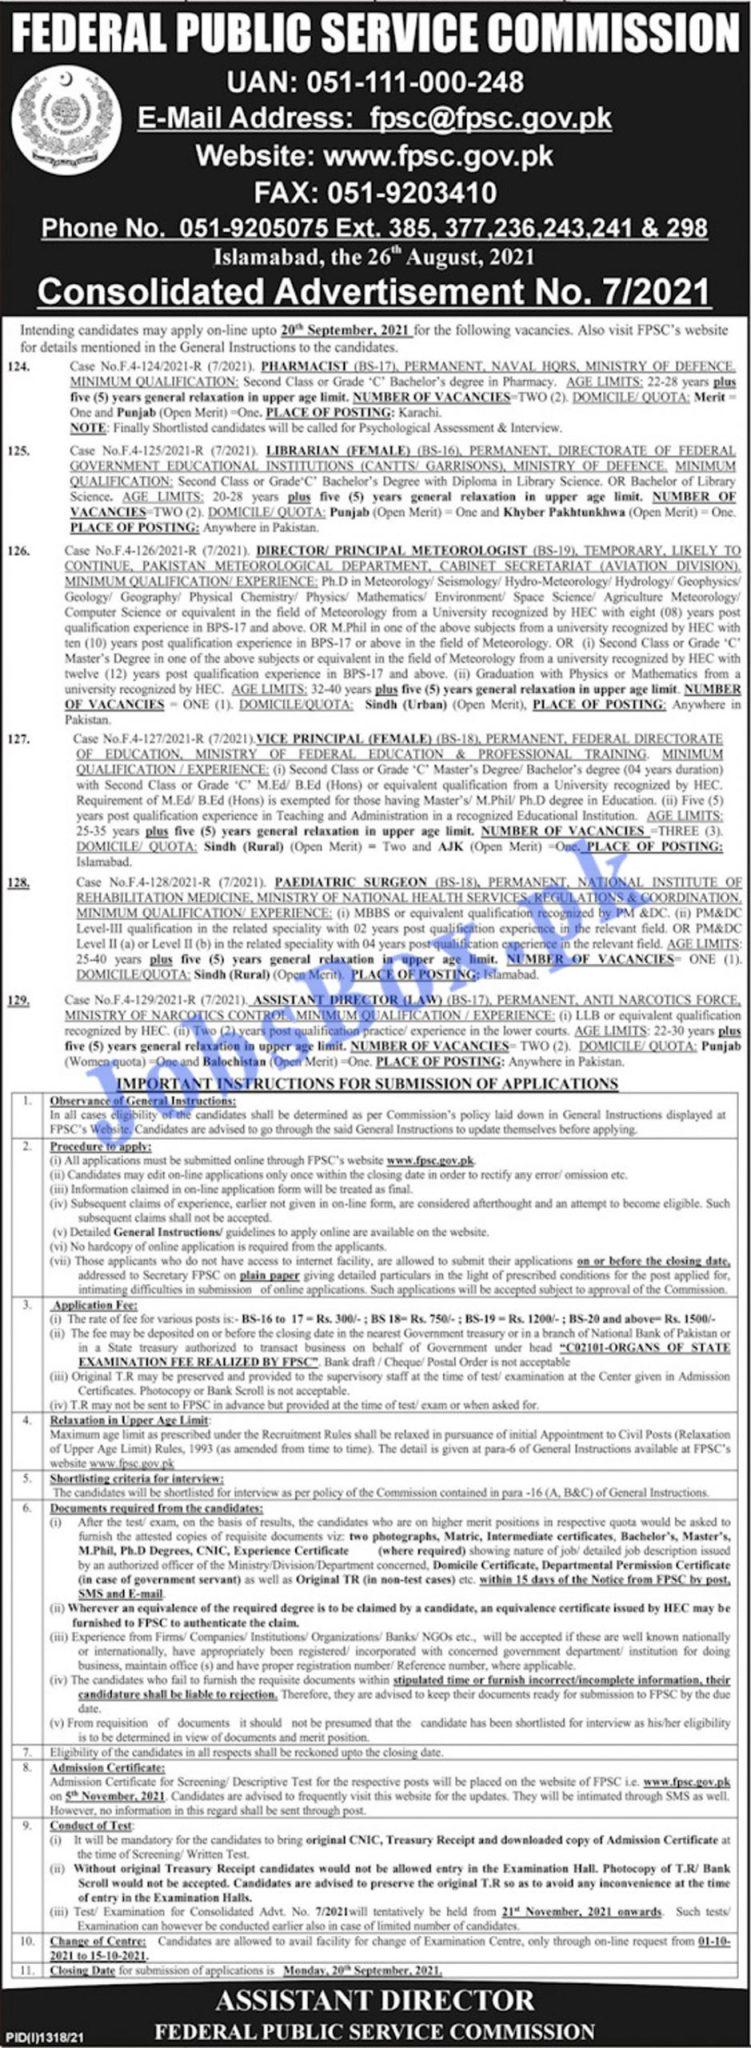 www.fpsc.gov.pk - FPSC Federal Public Service Commission Jobs 2021 in Pakistan